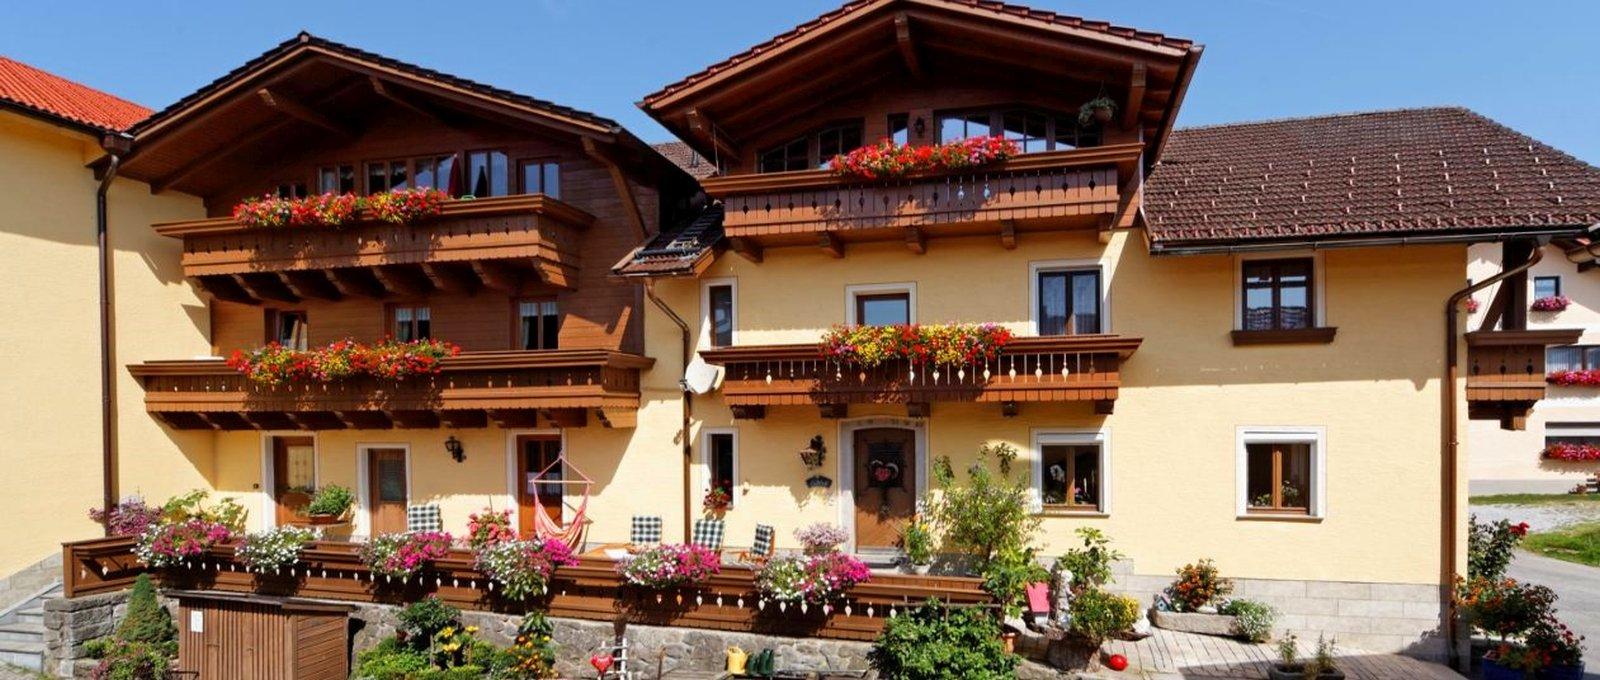 Ferienhaus Wenzl in Zwiesel – Kontakt